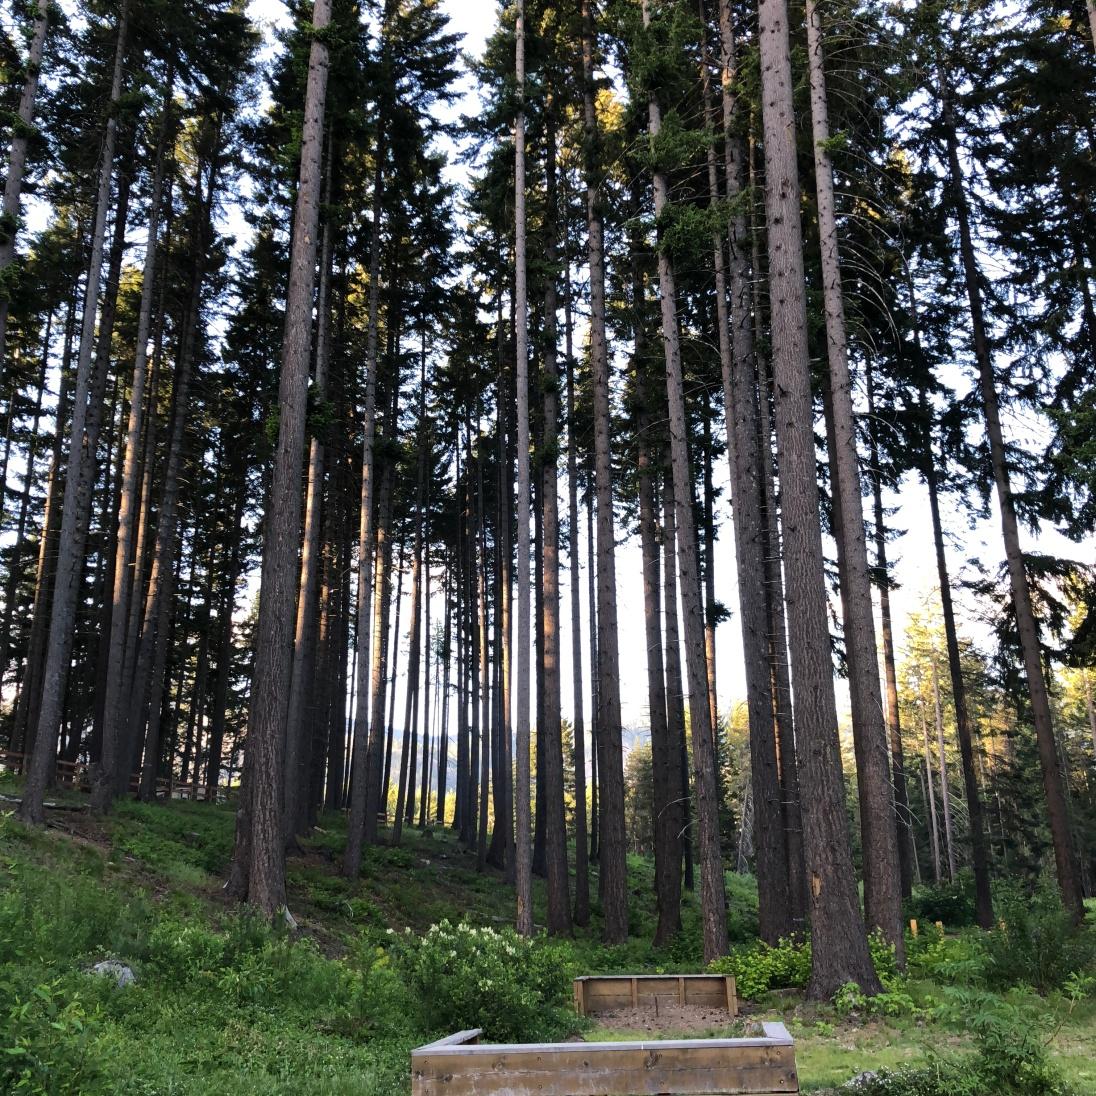 Trees everywhere